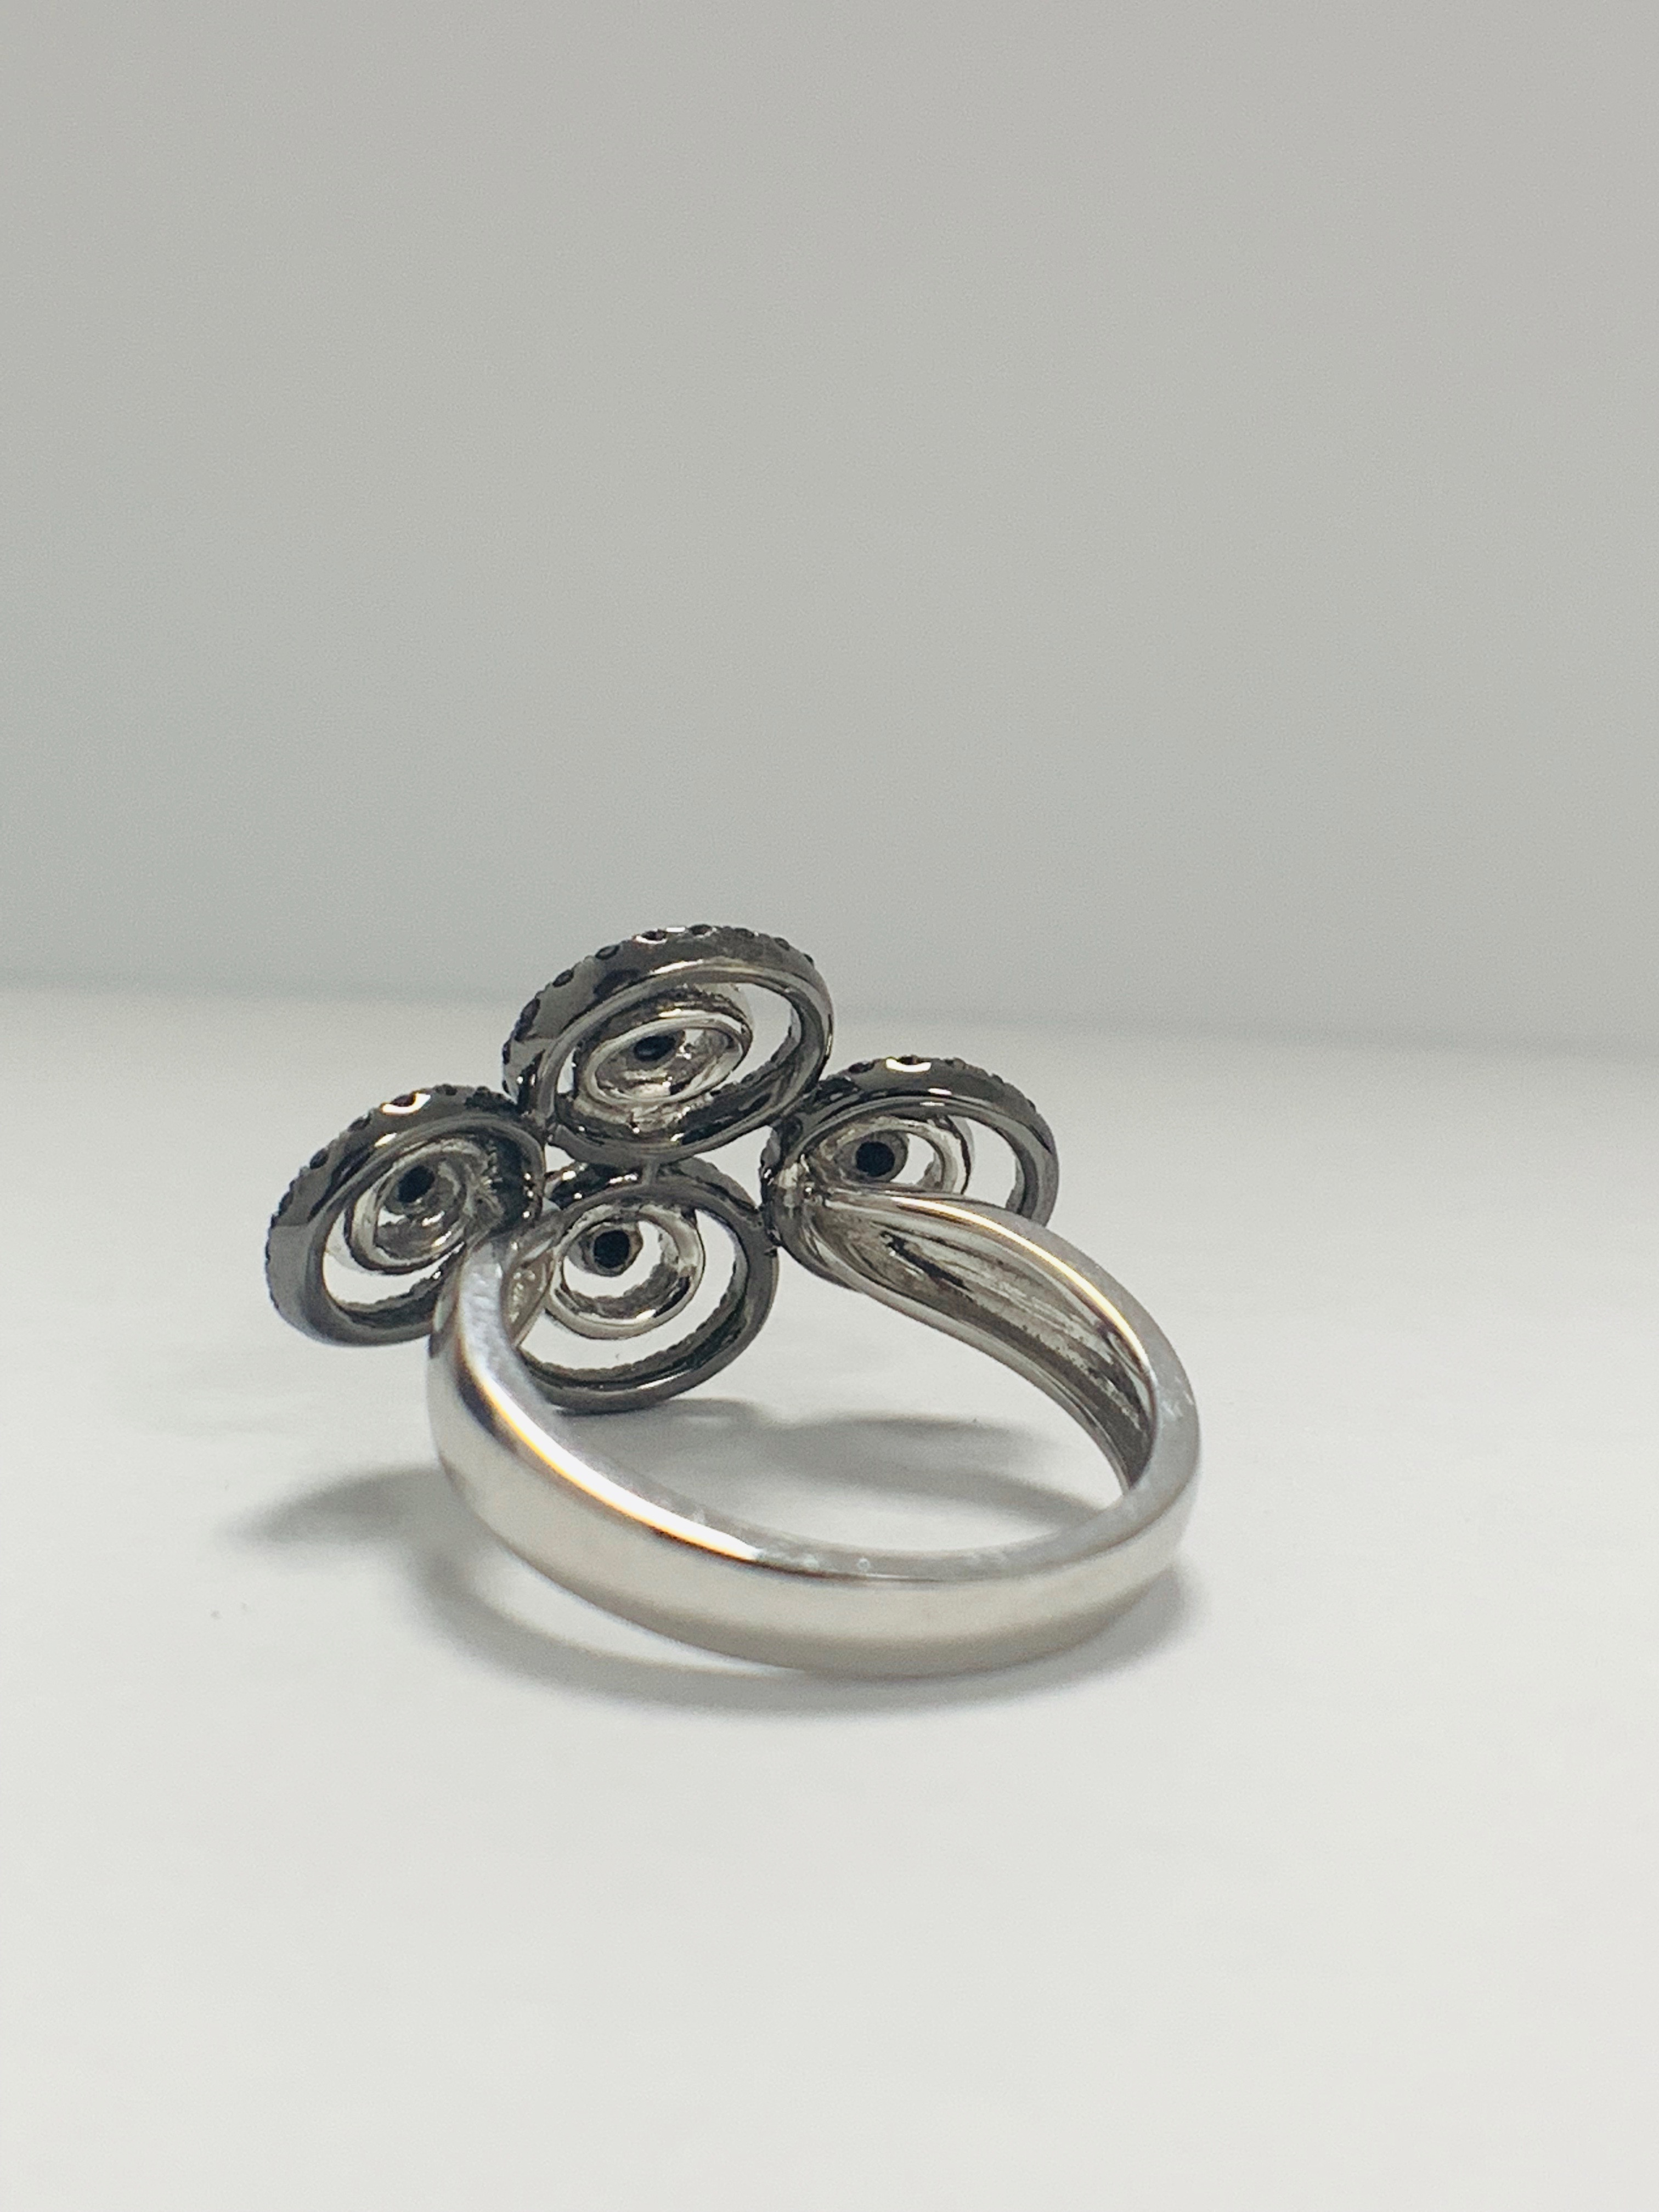 18ct White Gold Diamond ring featuring 80 round cut, black Diamonds (0.61ct TBDW) - Image 4 of 12